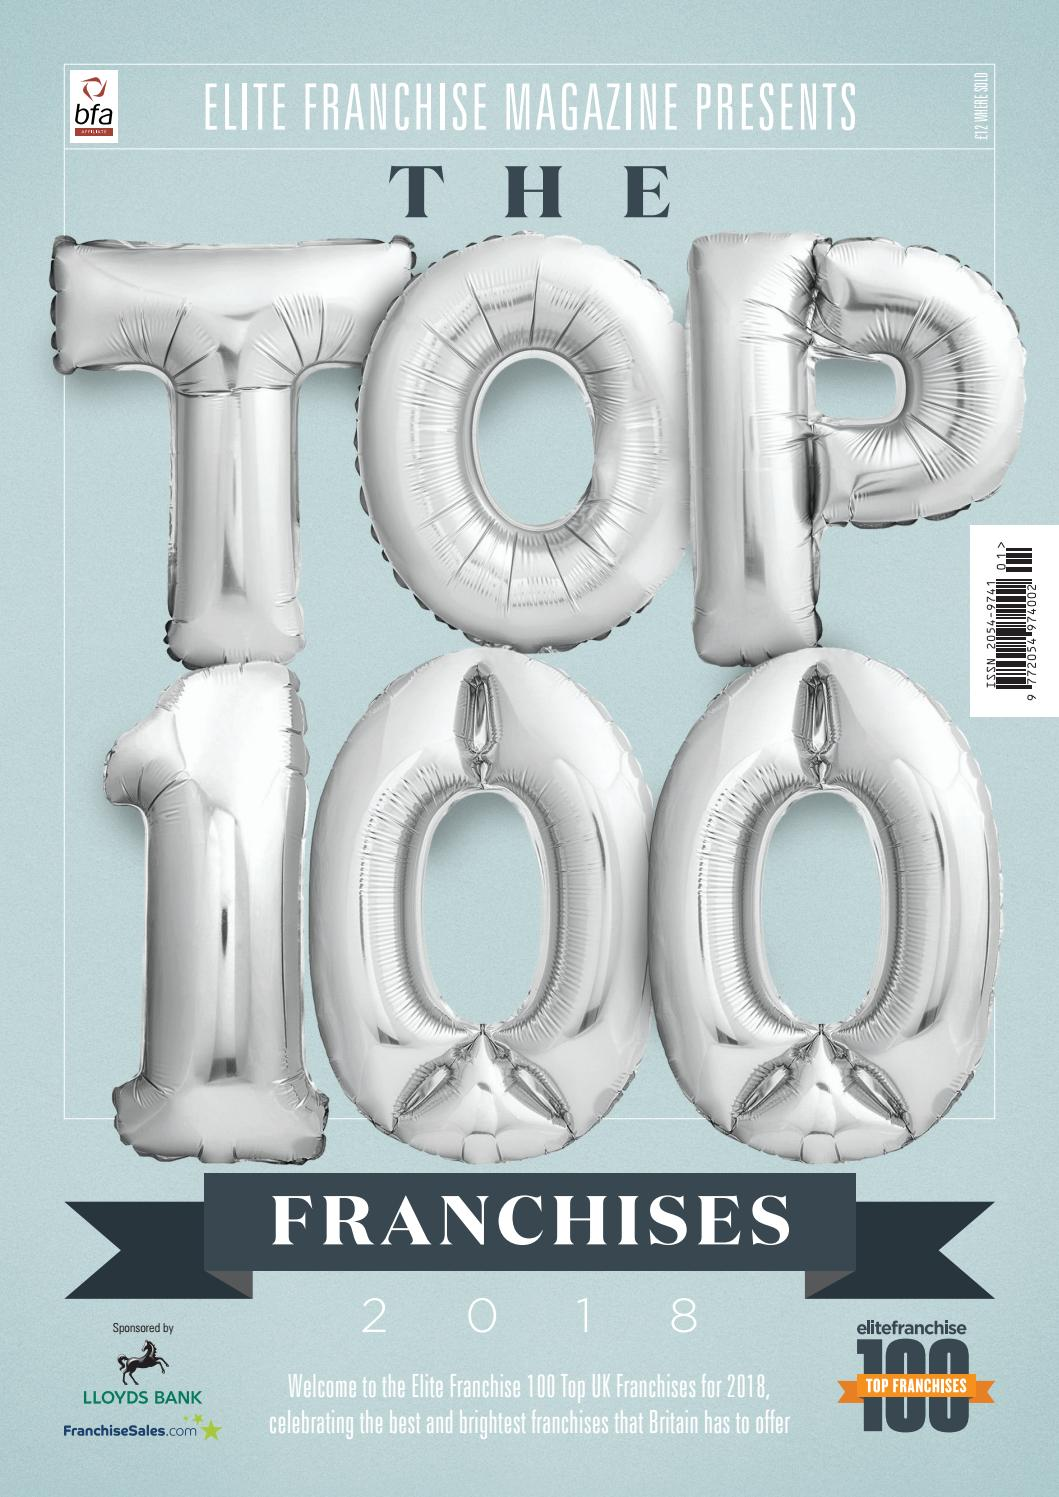 Elite Franchise 100 Guide 2018 by Elite Business Magazine - issuu